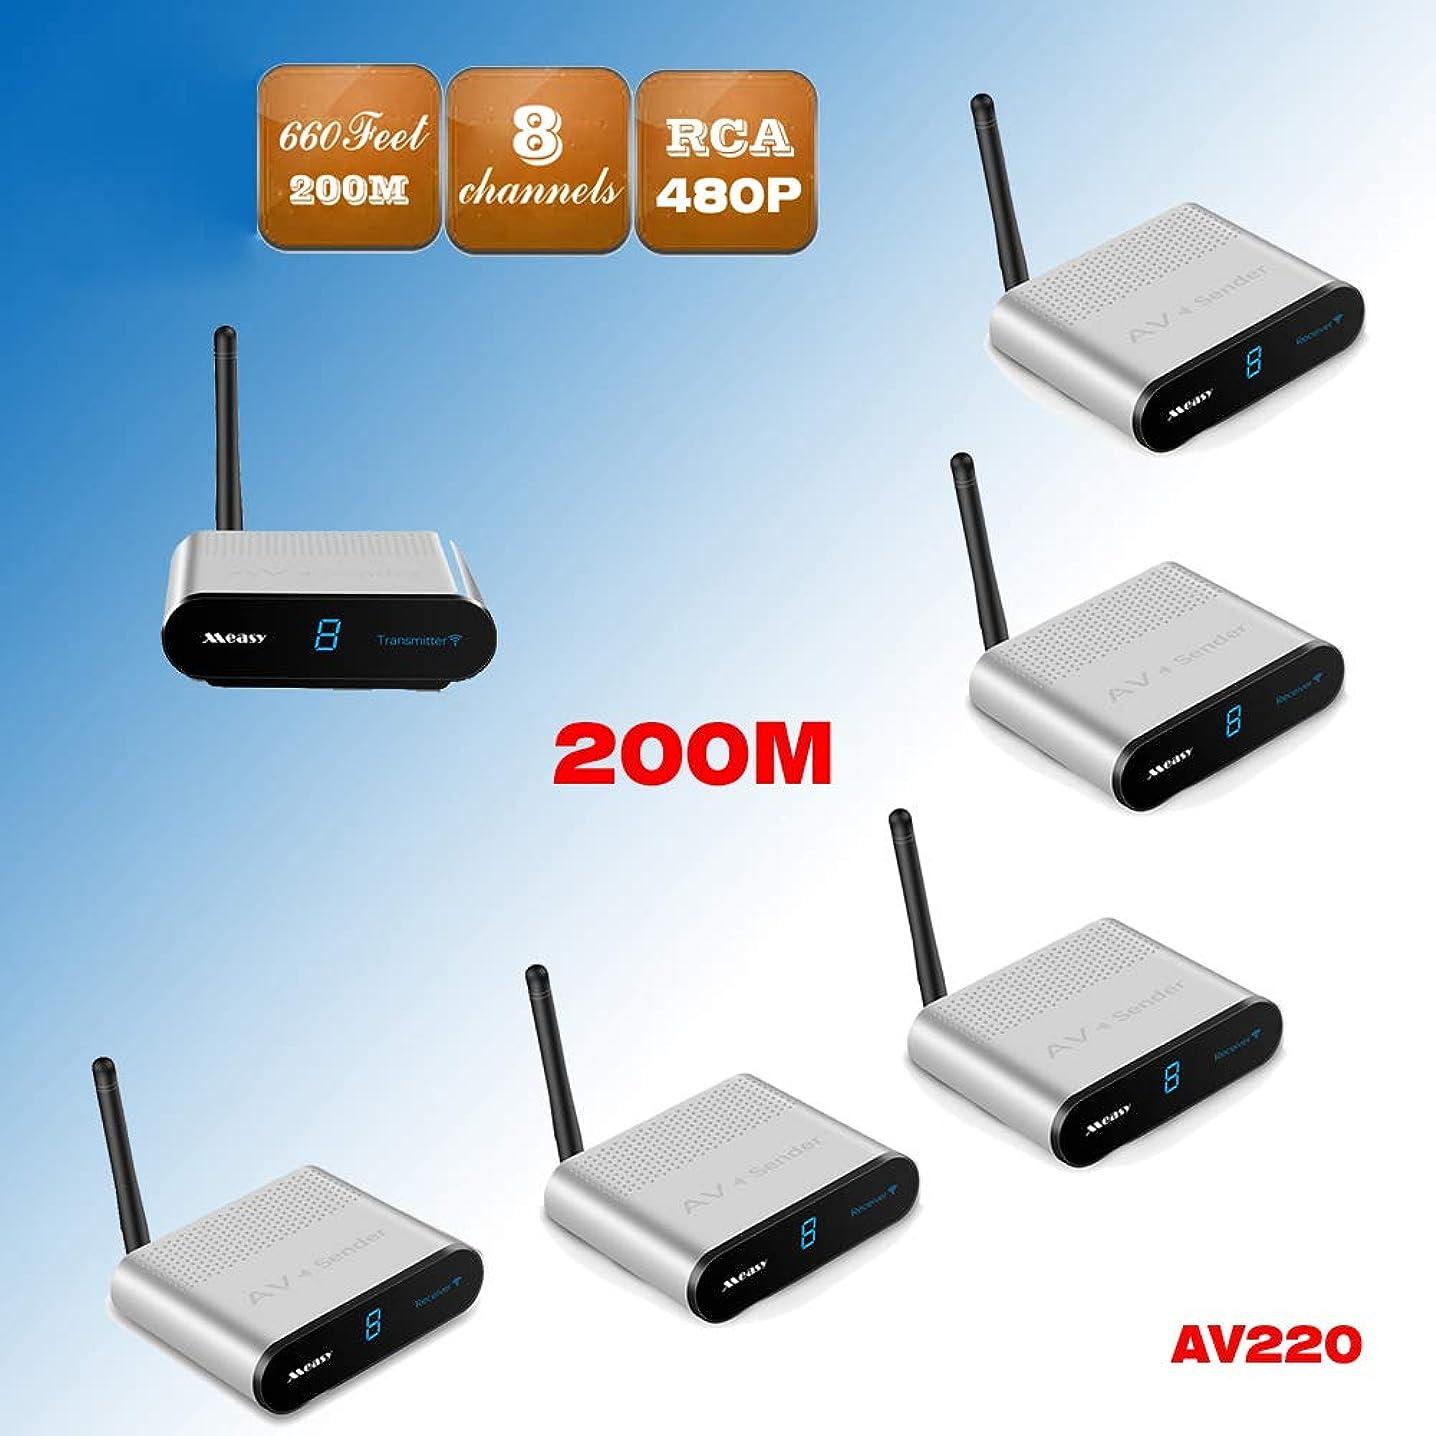 MEASY AV220-5 (1X5) 2.4G Wireless AV Audio & Video Sender Transmitter & Receiver System Support Transmission up to 200m/660 feet for DVD/DVR/IPTV/CCTV Camera/TV